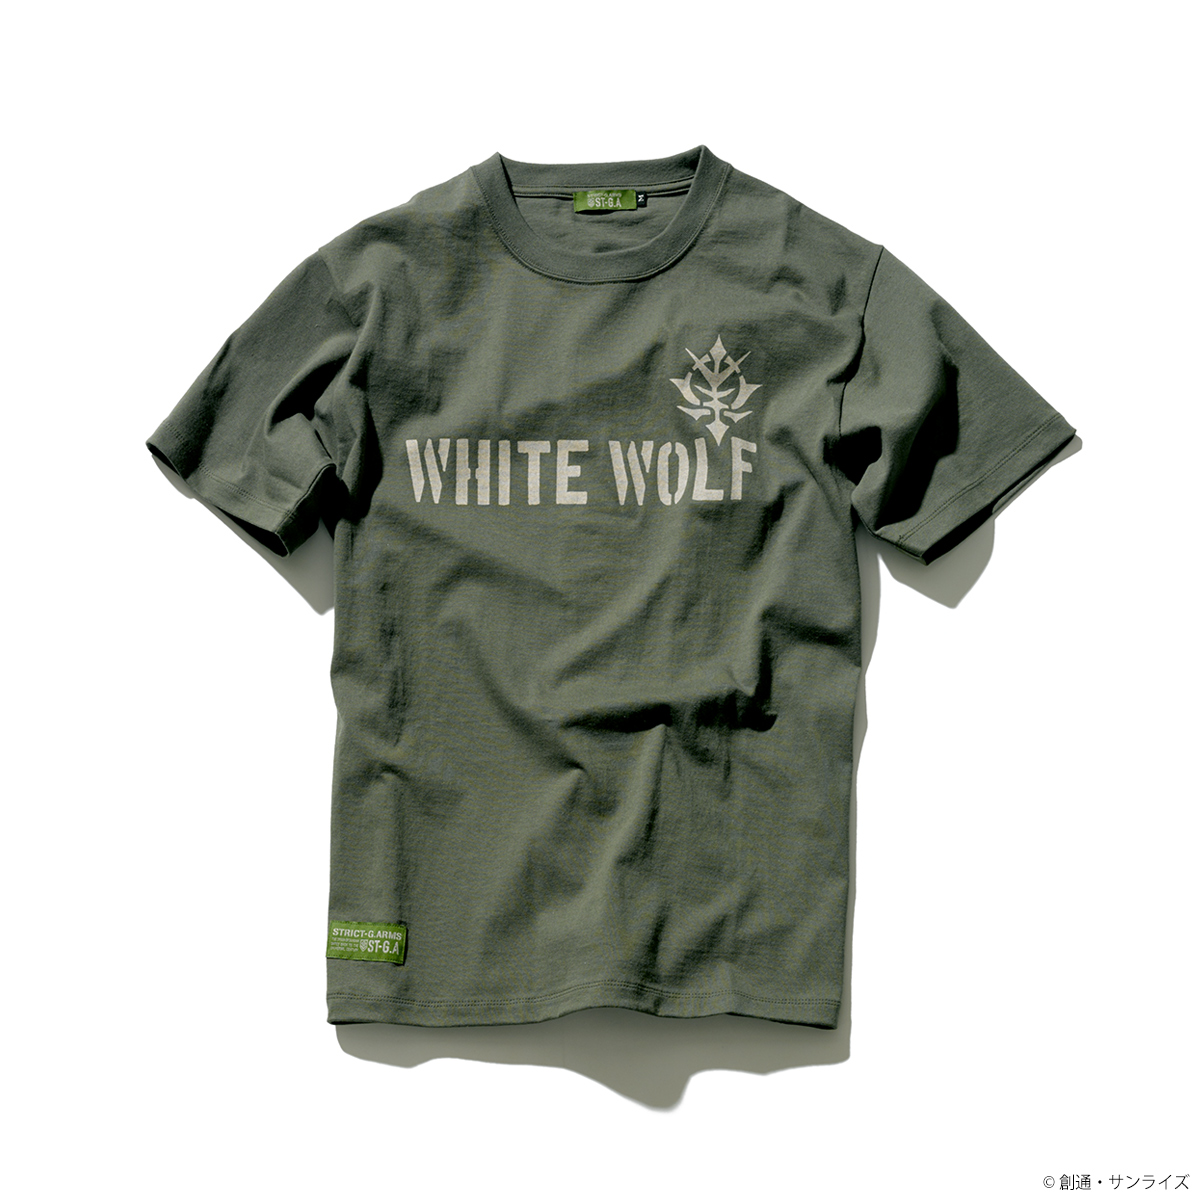 STRICT-G.ARMS『機動戦士ガンダム』 Tシャツ WHITE WOLFロゴ